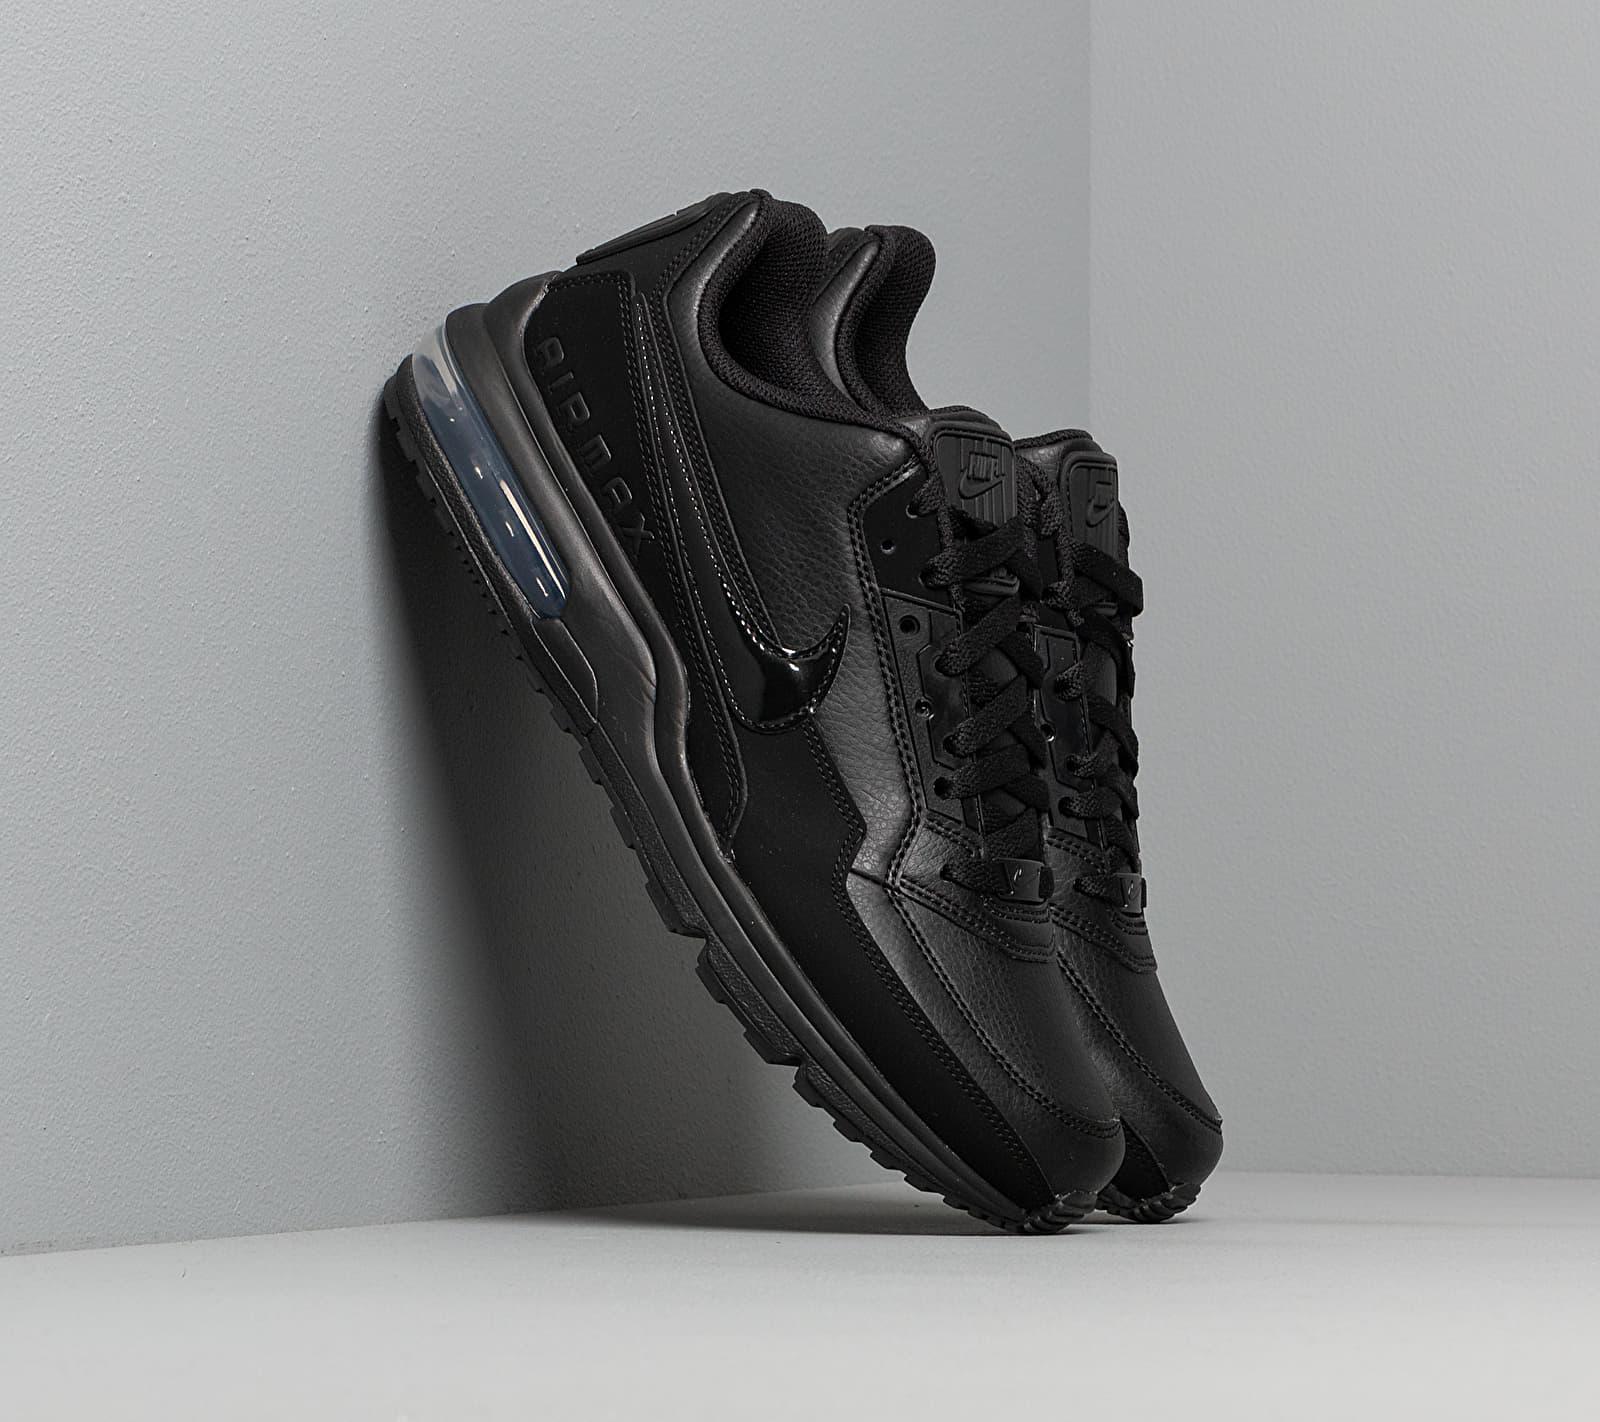 Nike Air Max LTD 3 Black/ Black-Black 687977-020